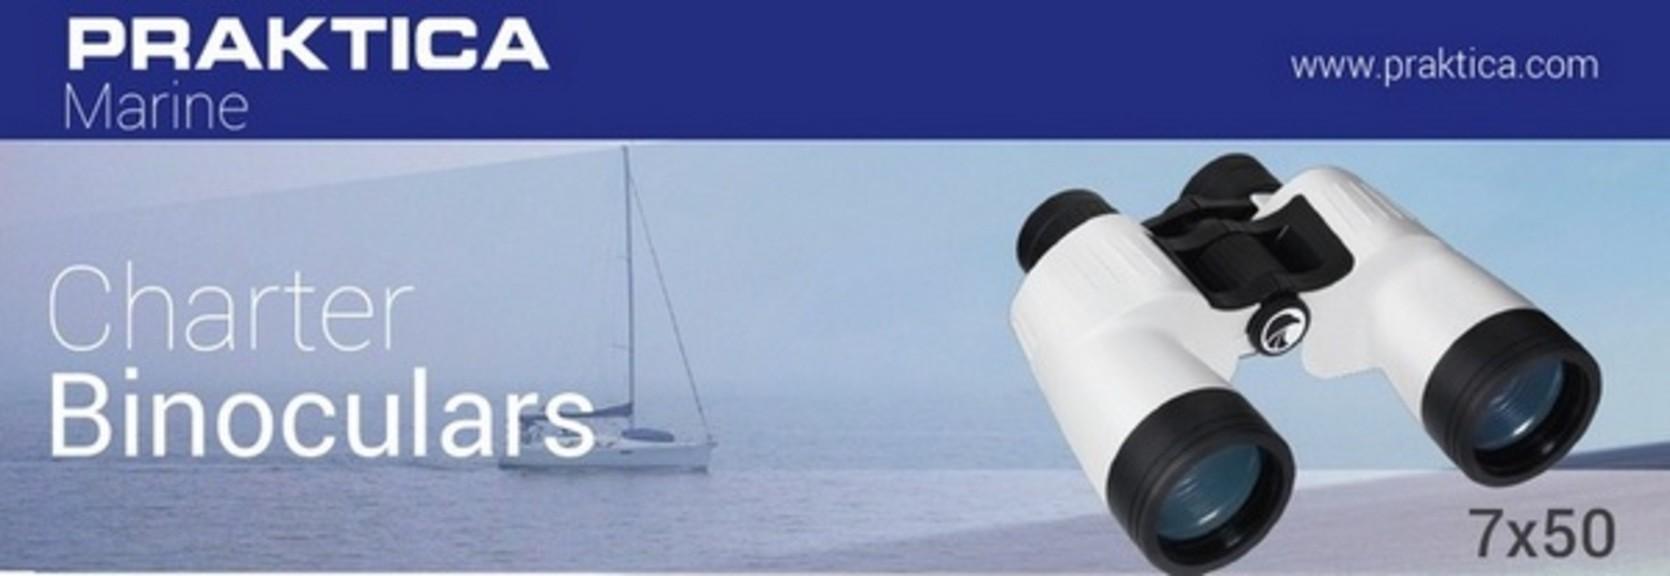 Бинокль Praktica Marine Charter 7x50